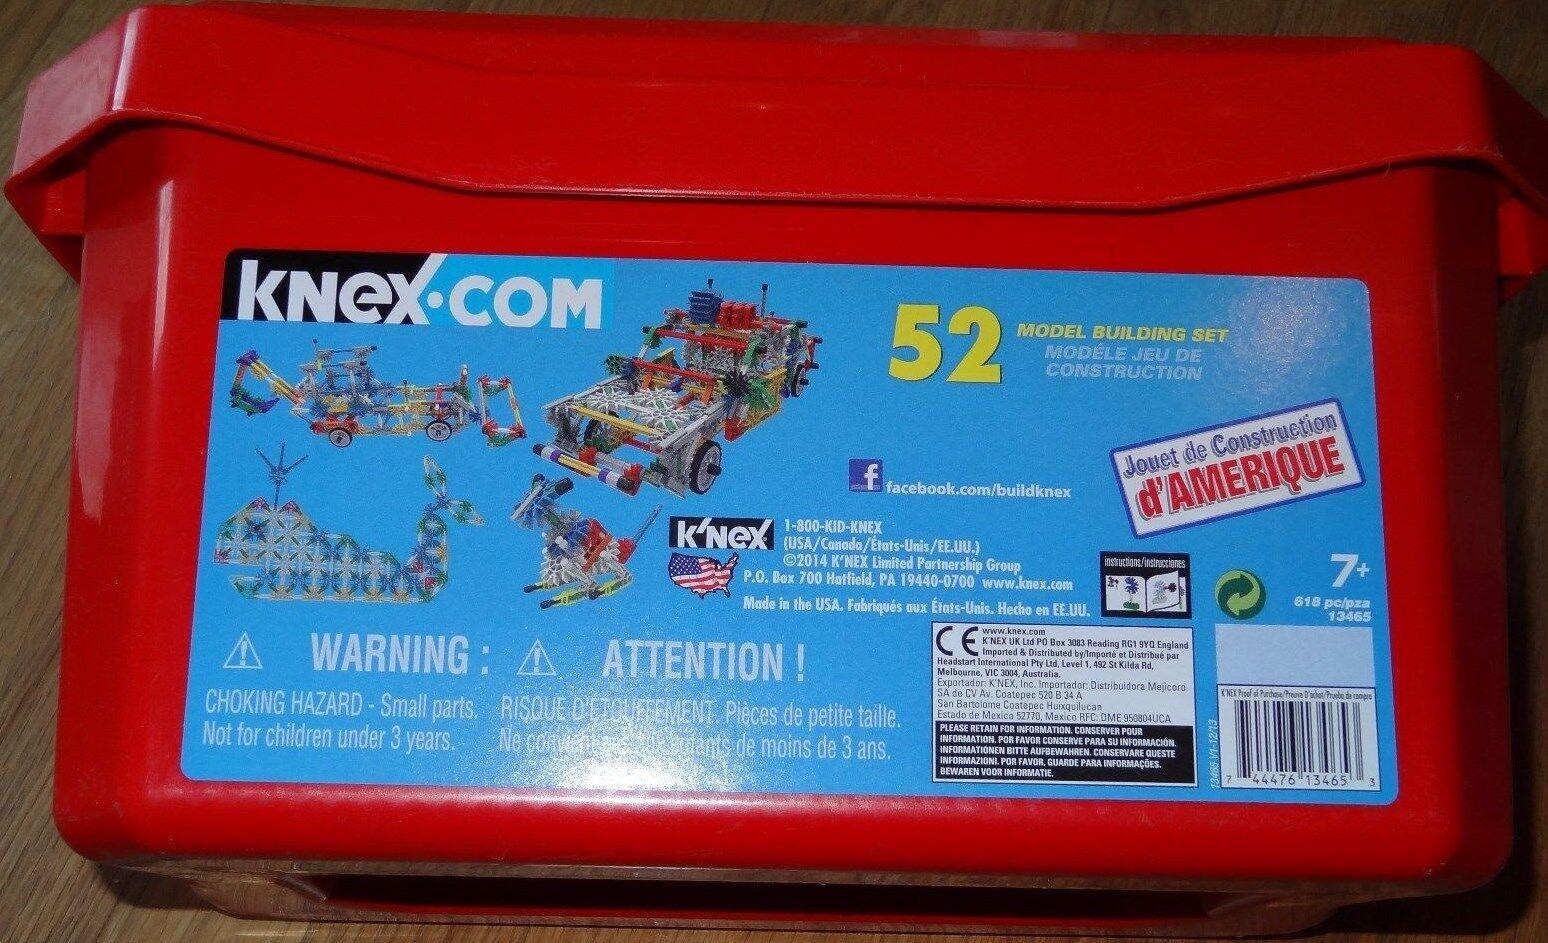 K'NEX 52 Model Building Set Construction Toy KNEX KNEX KNEX 13465 ede750